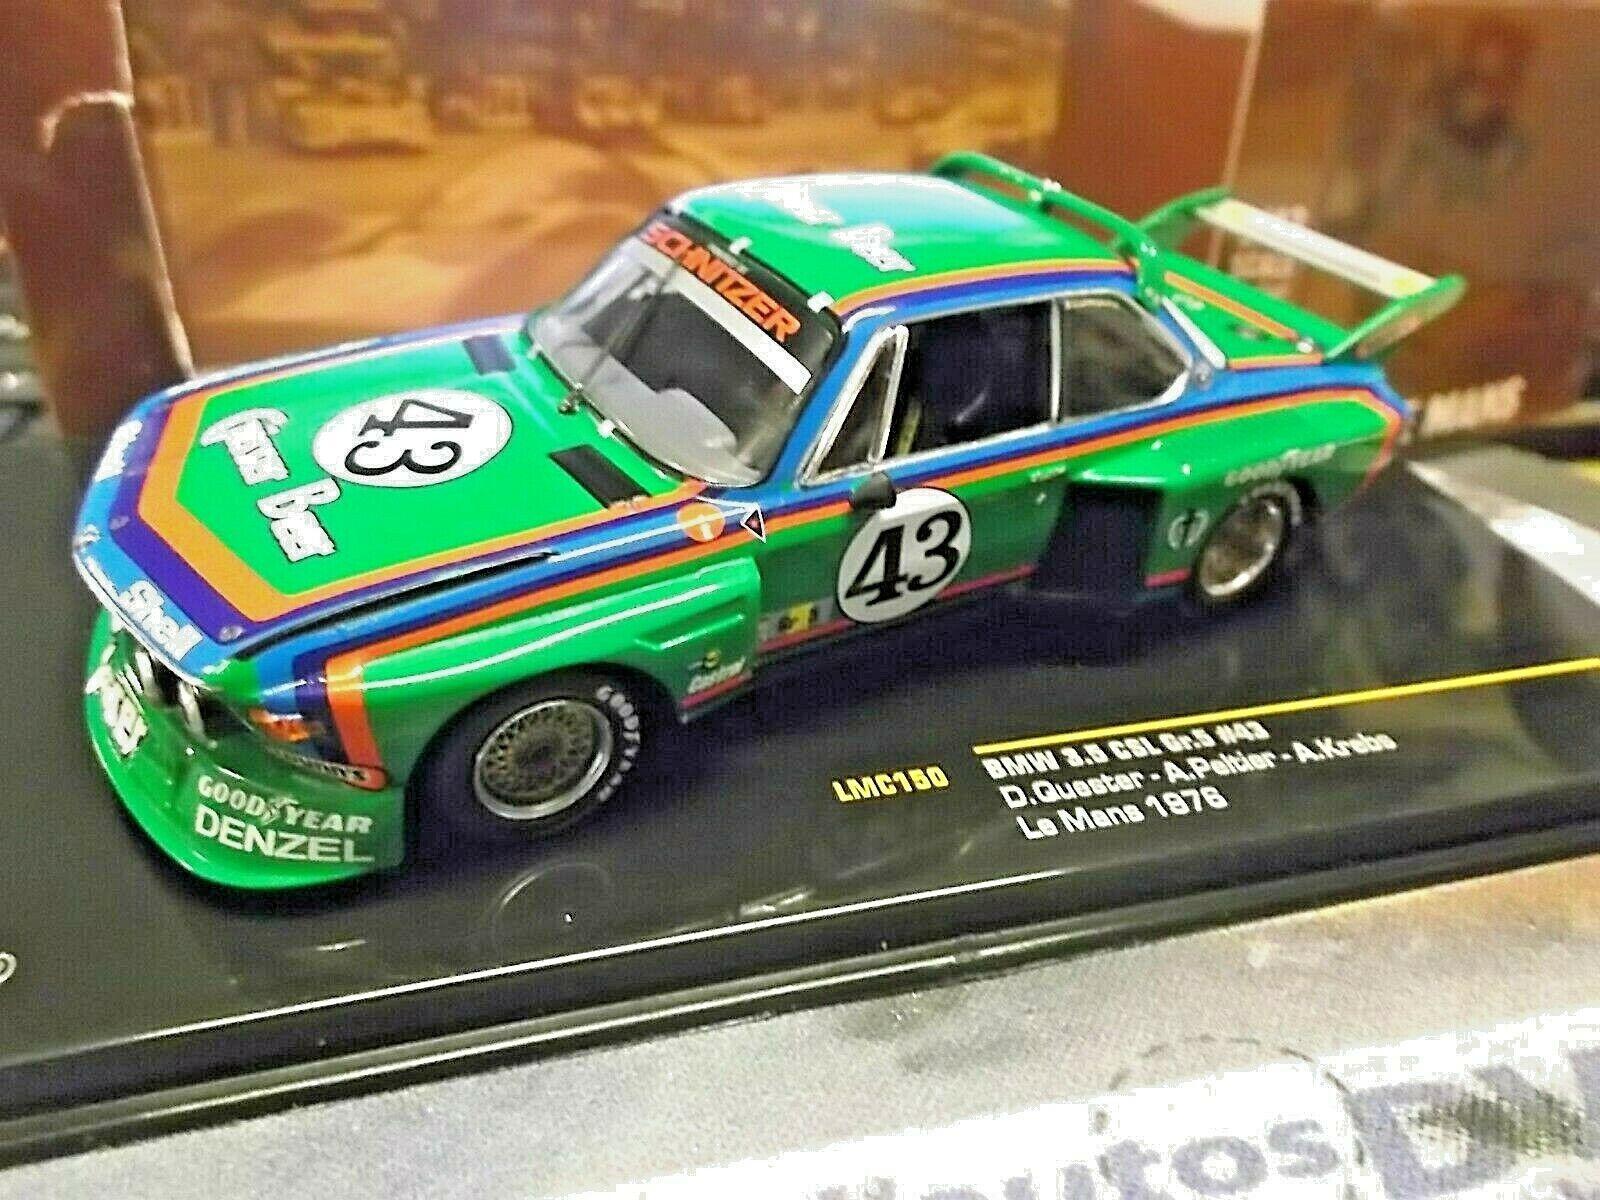 BMW 3.5 CSL MIS. 5 Le Uomo 1976  43 Gösser BEER Quester cancro Peltier Ixo 1 43